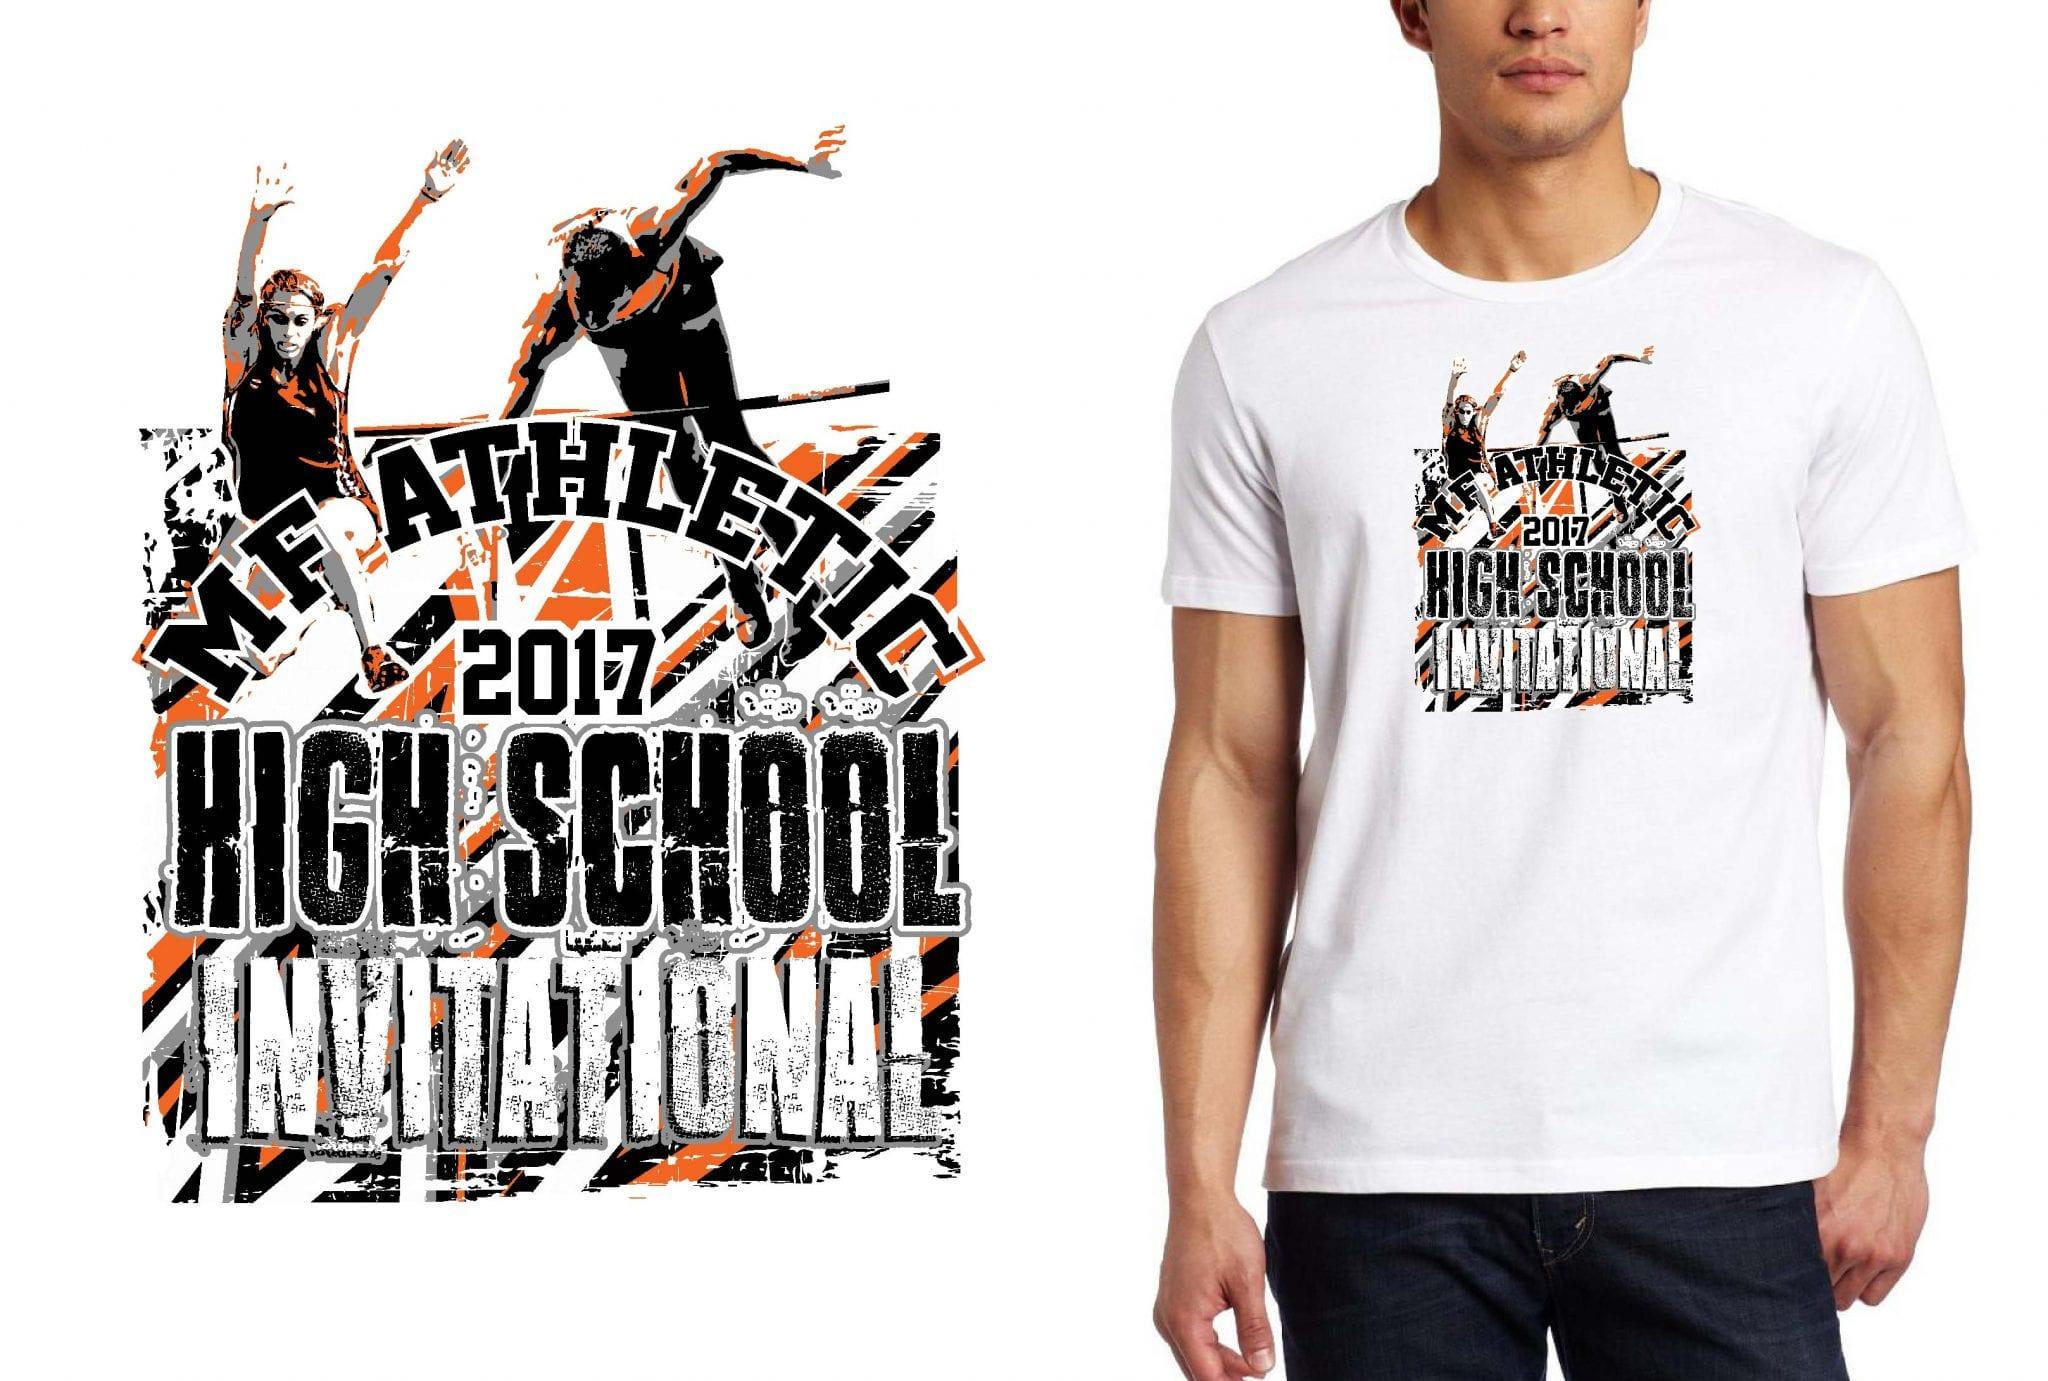 TRACK LOGO for M F Athletic High School Invitational T-SHIRT UrArtStudio